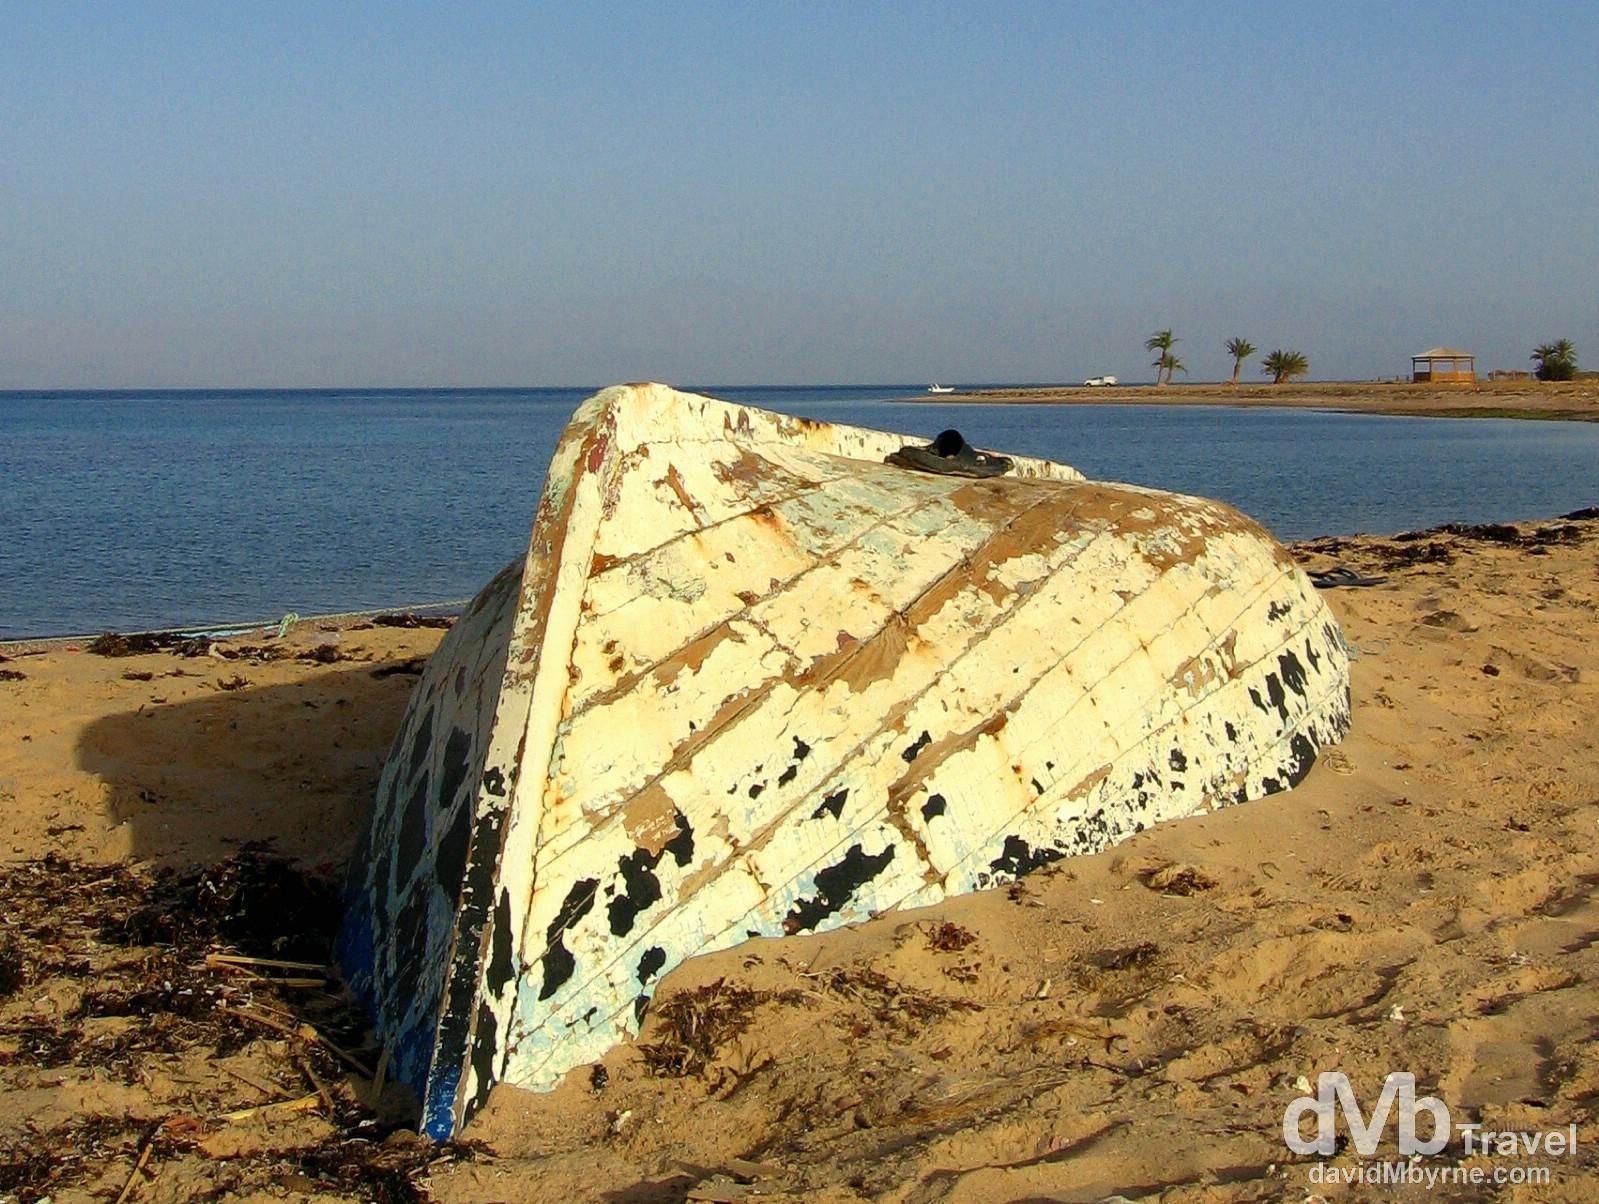 Soft Beach Camp, Nuweiba, Sinai Peninsula, Egypt. April 23, 2008.